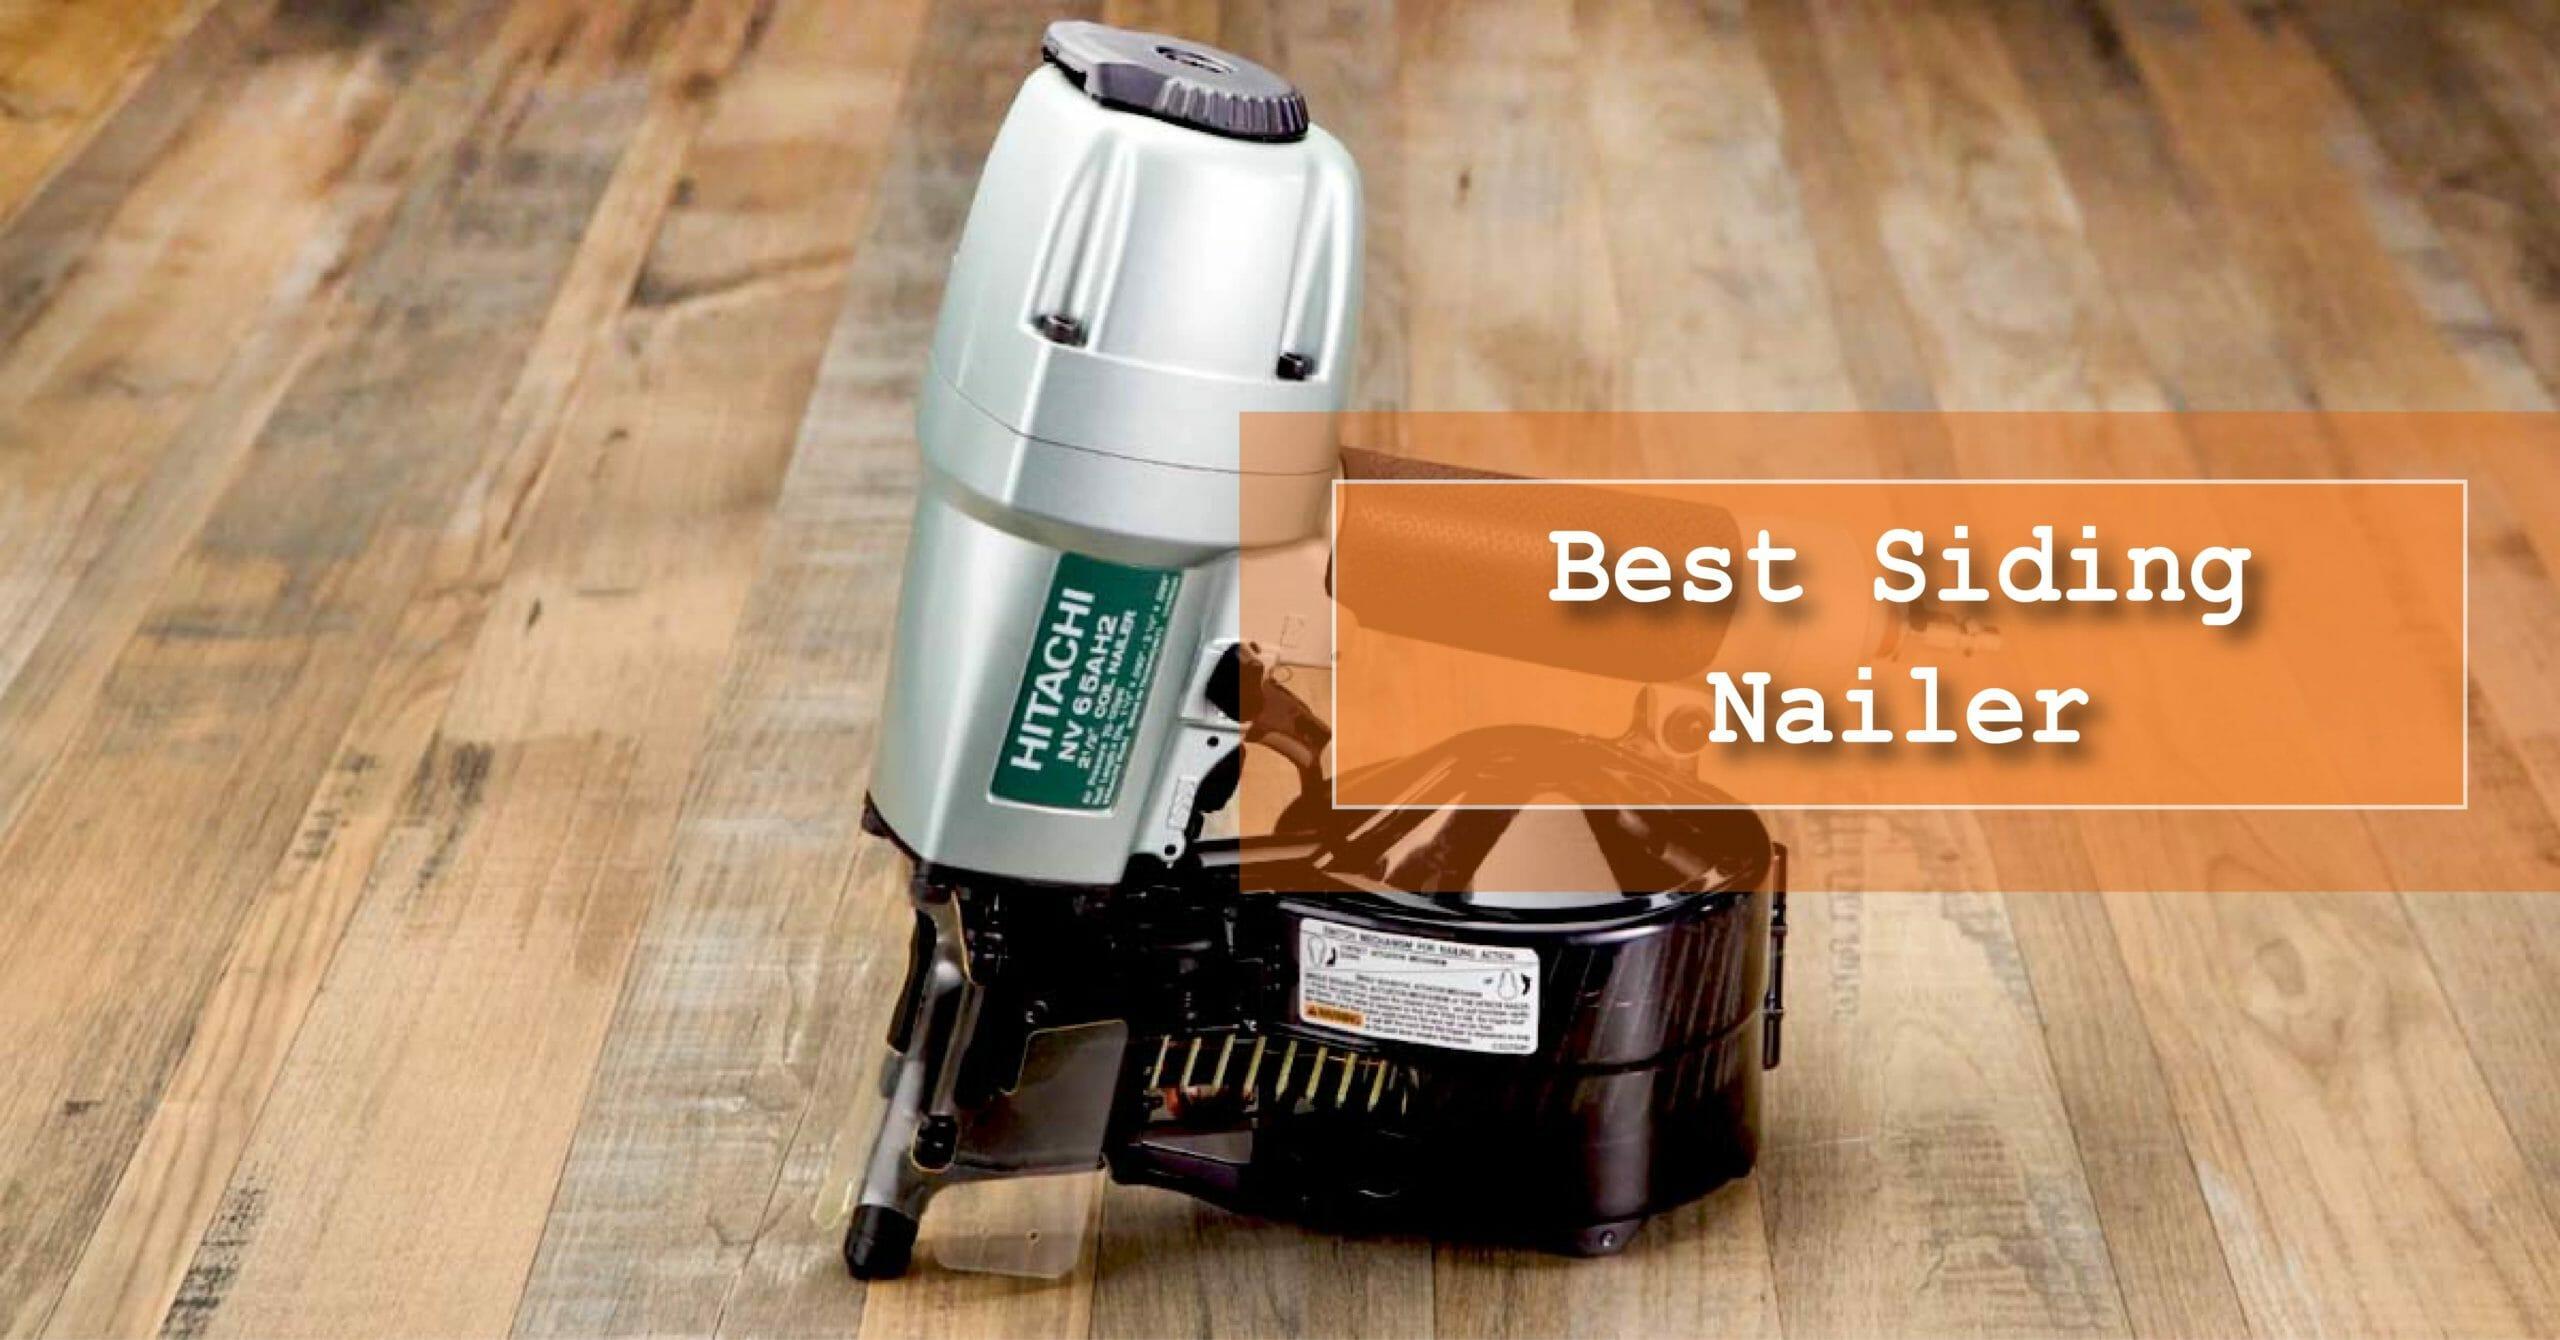 Best siding nailer